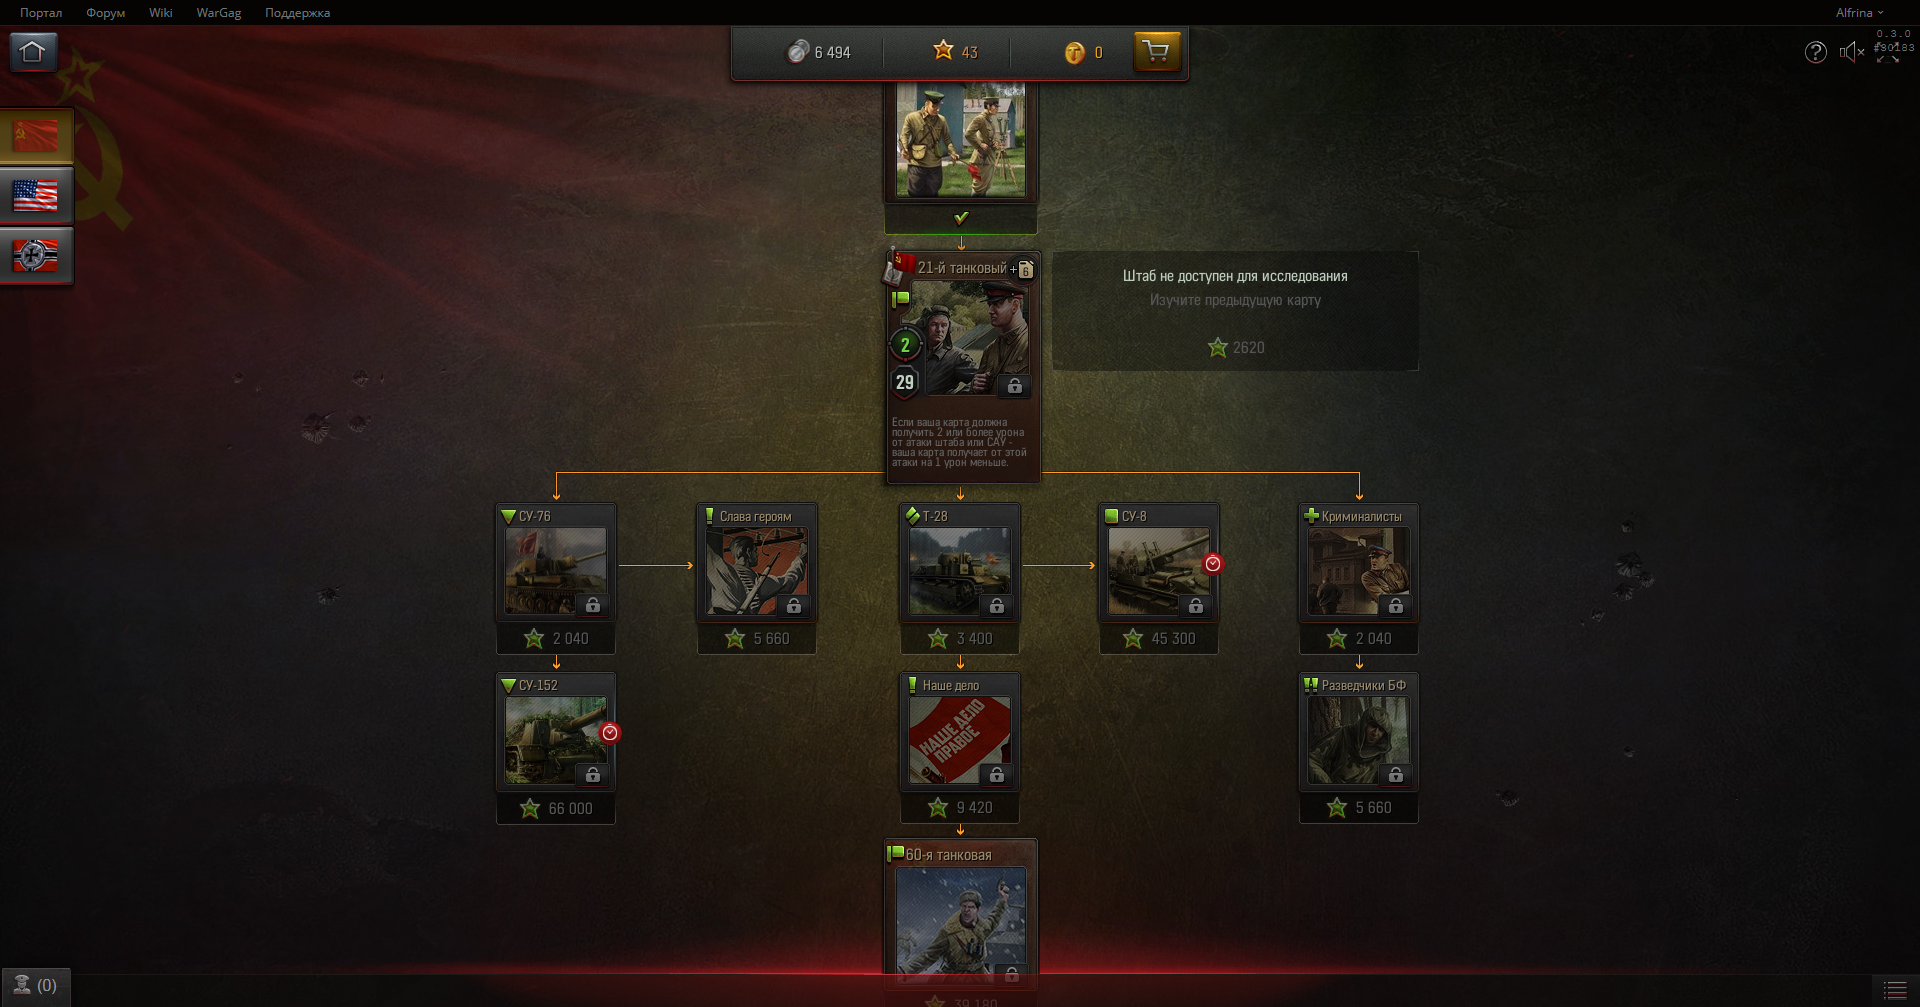 Раздача ключей в бета-версию World of Tanks Generals!. - Изображение 4